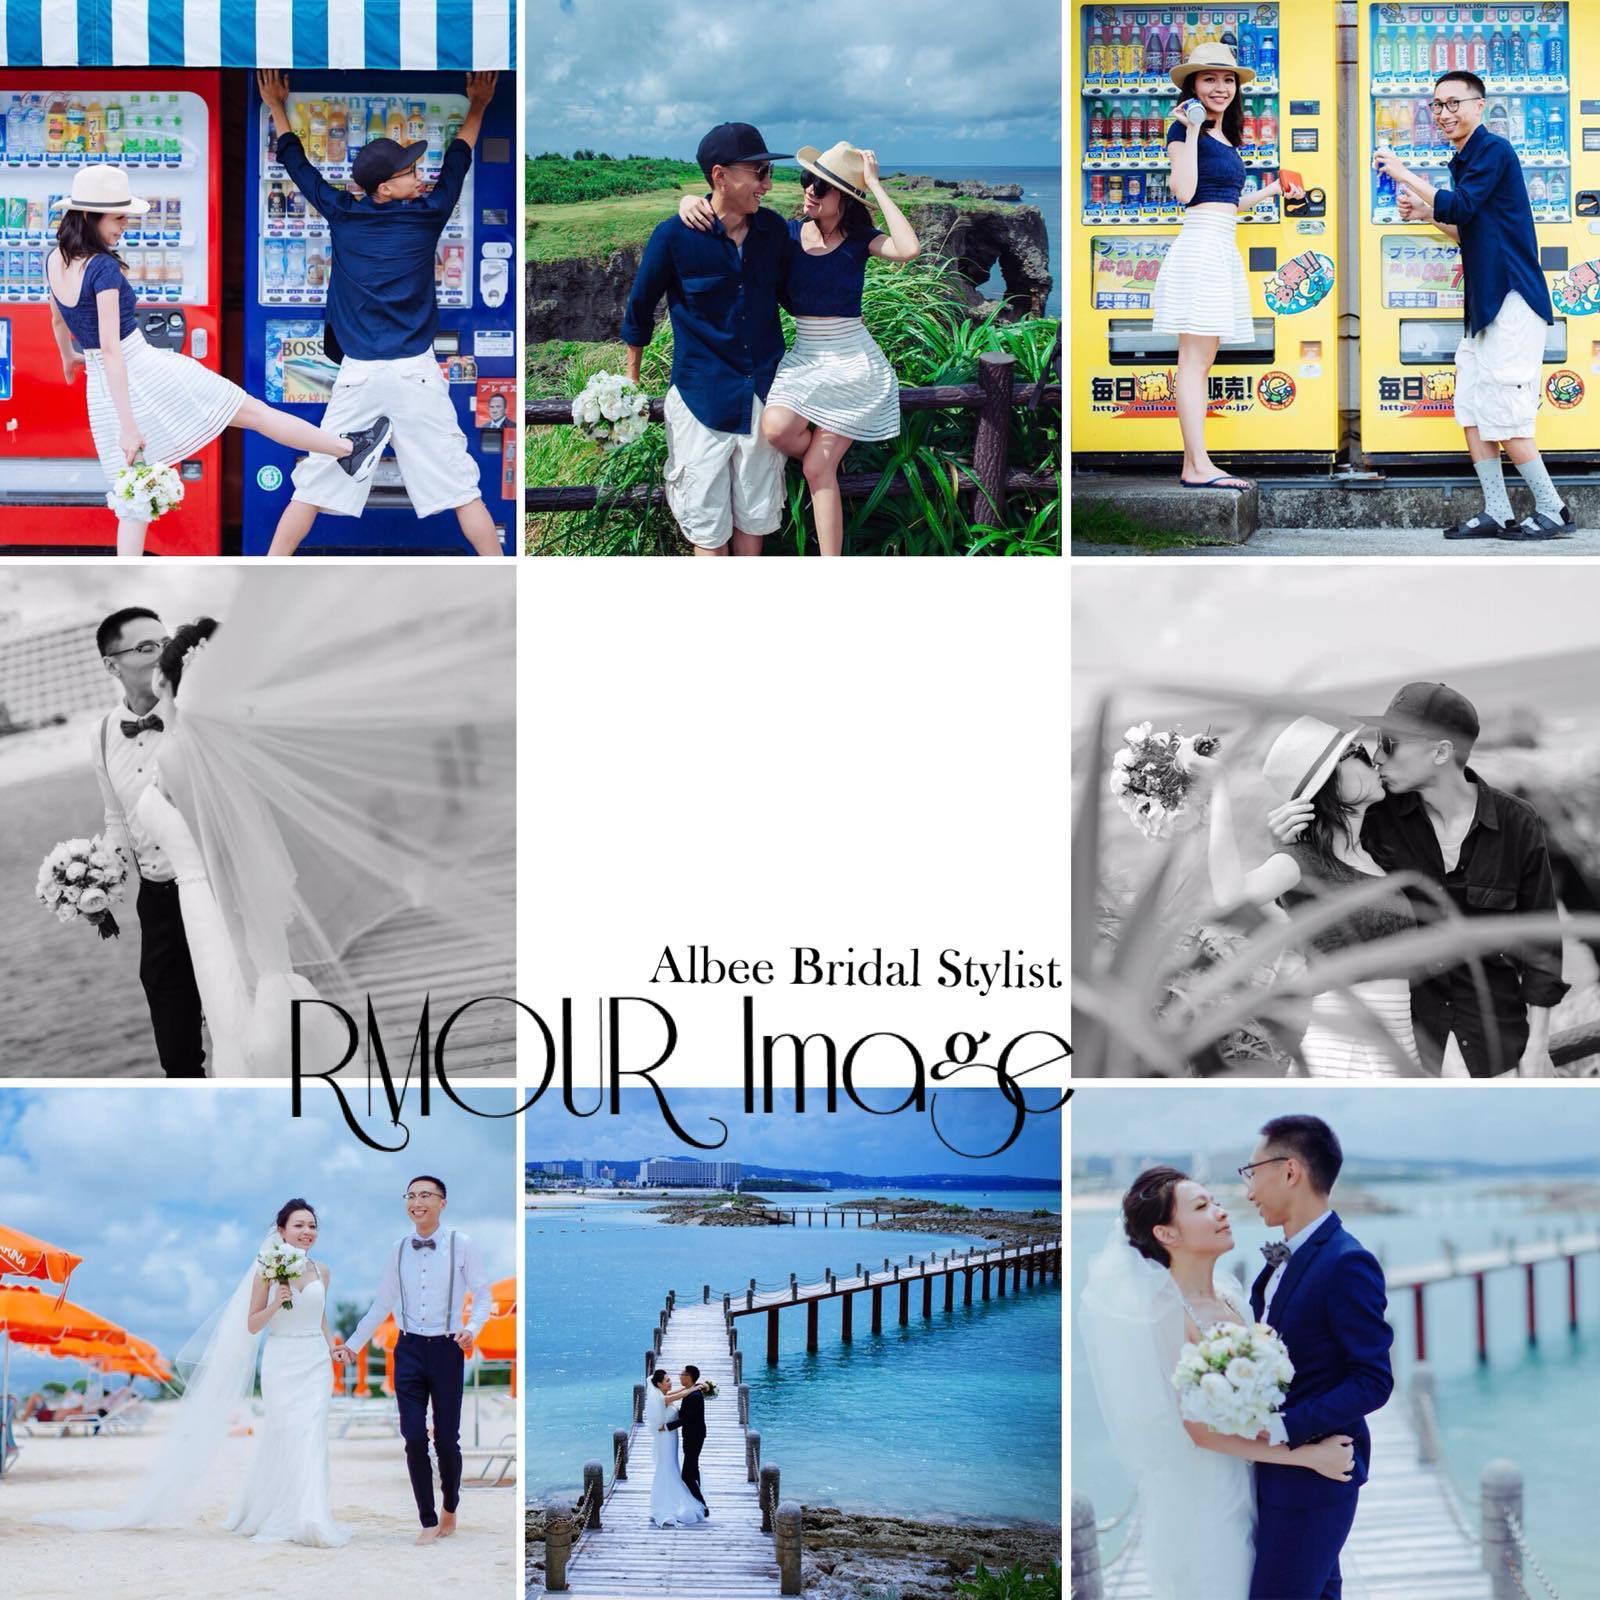 【Pre Wedding】Allan ❤️ Phoebe